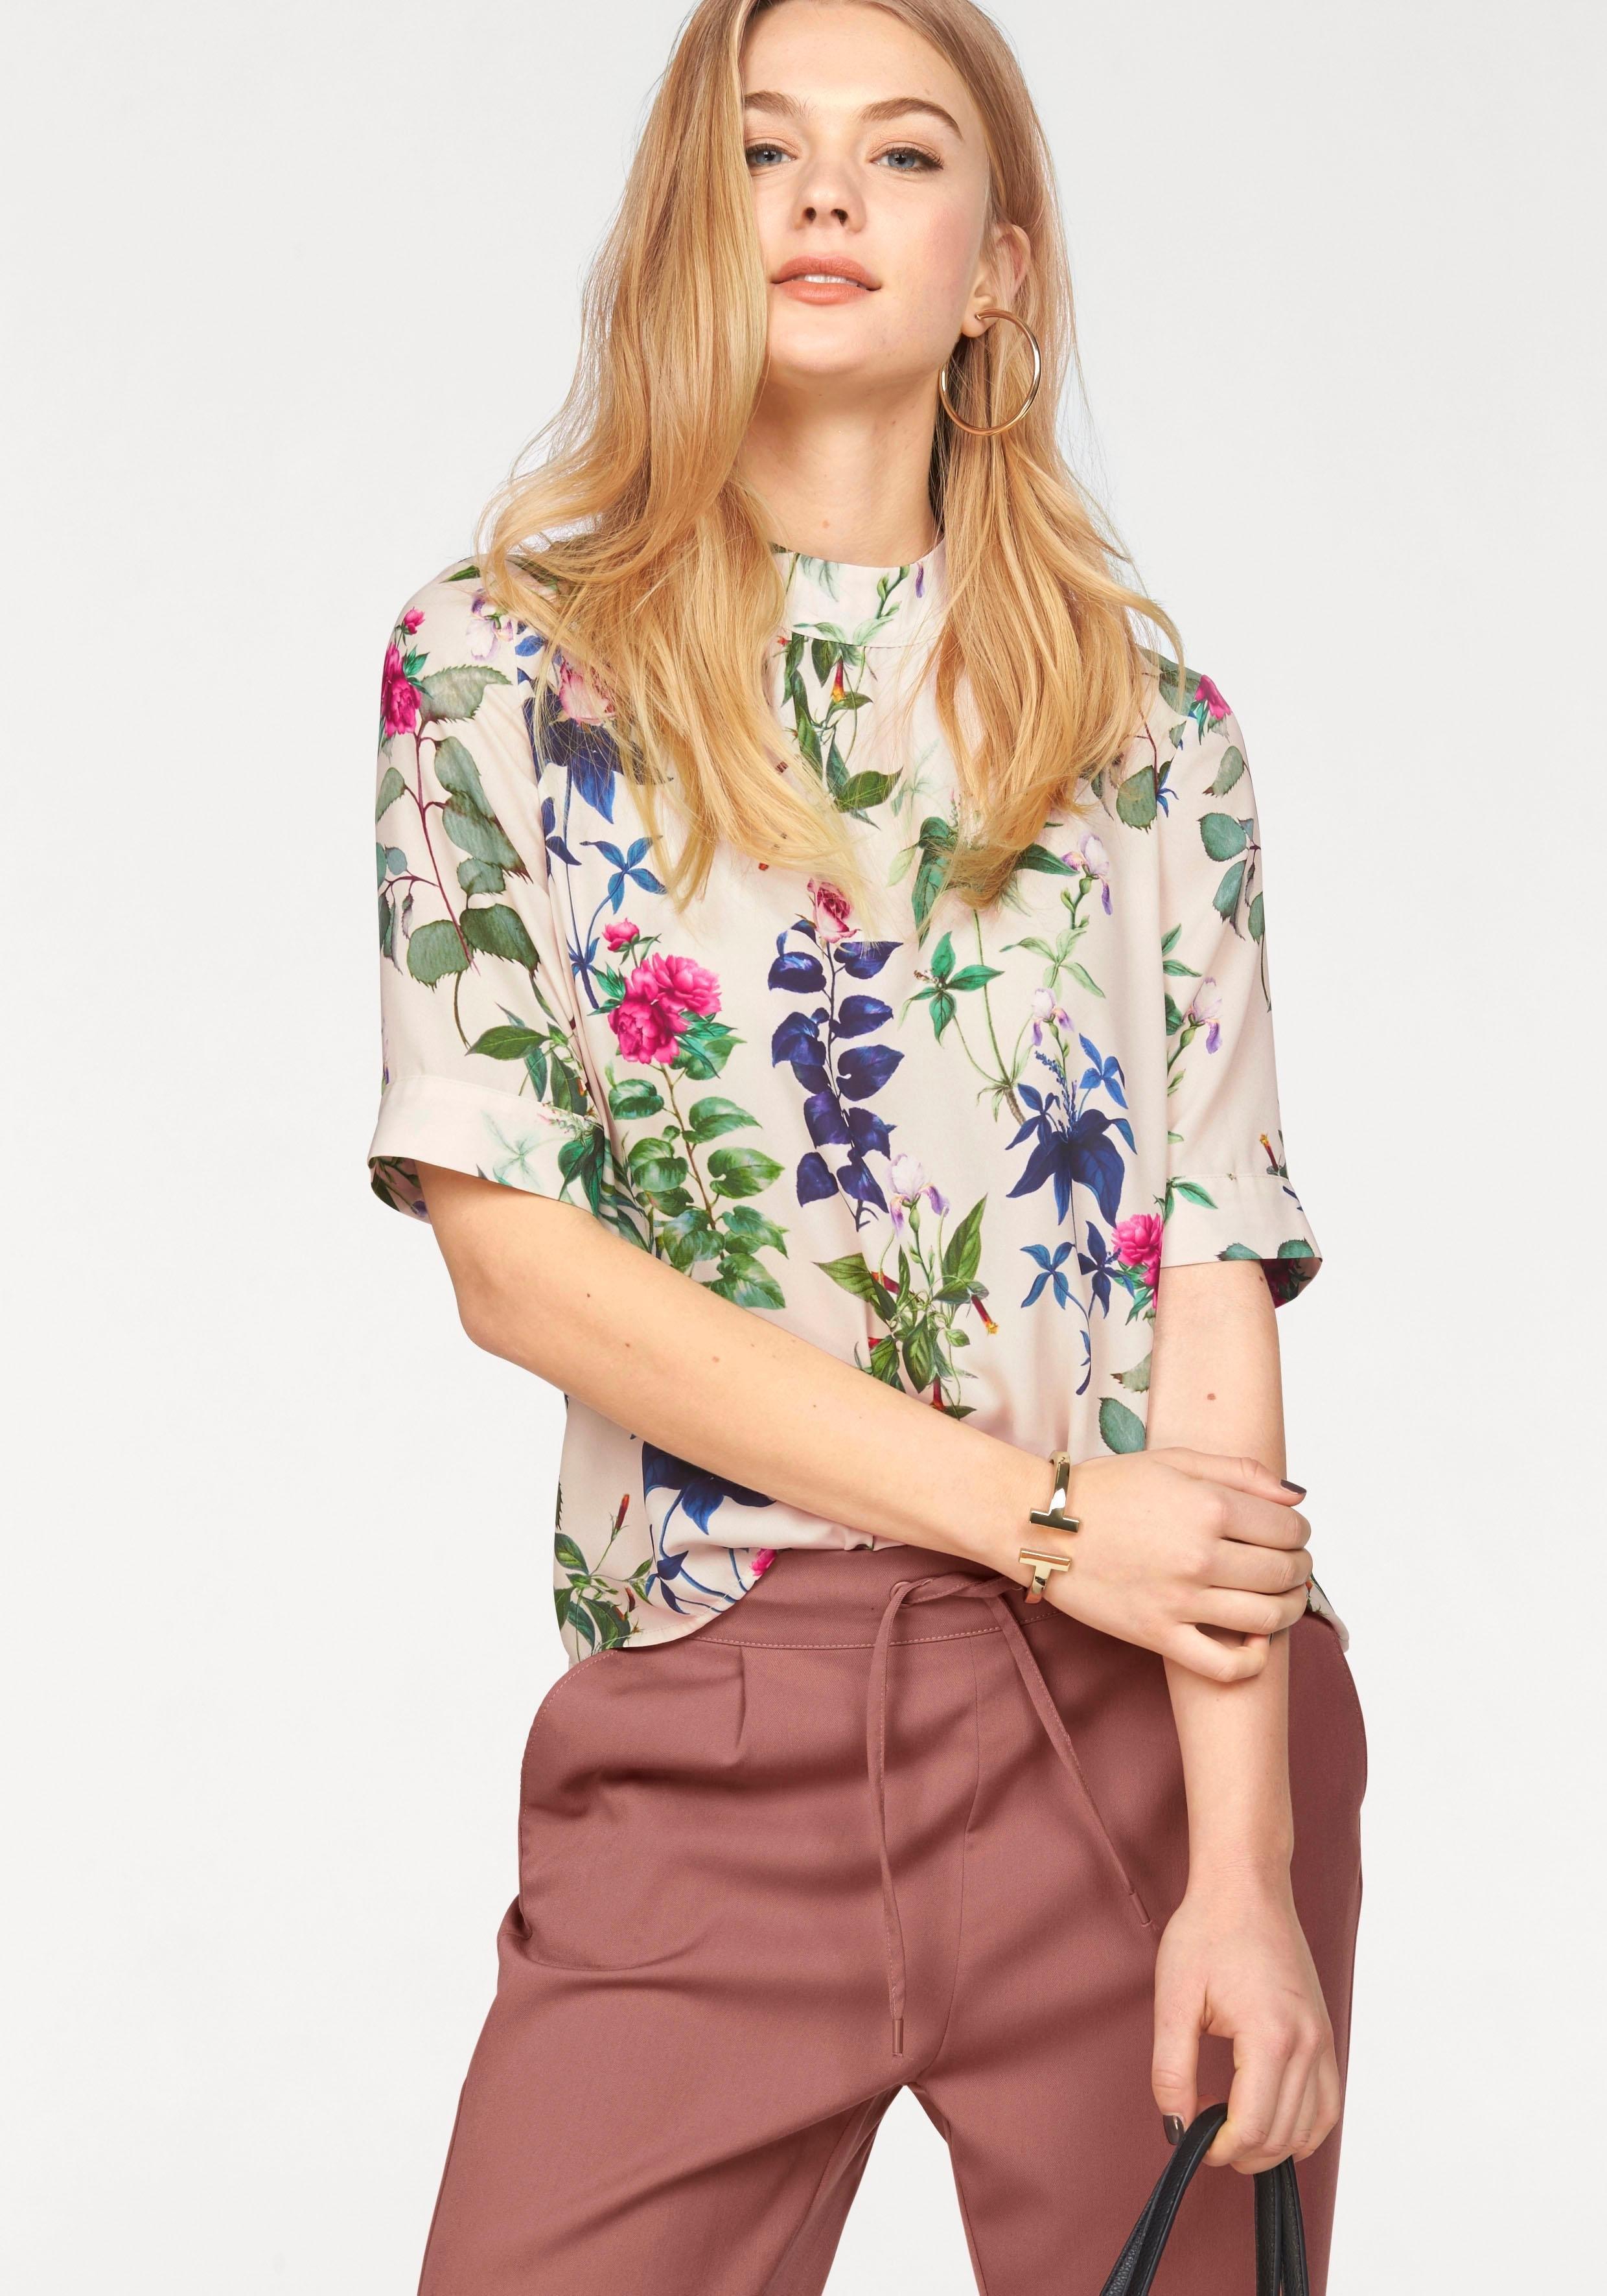 VERO MODA shirt veilig op otto.nl kopen